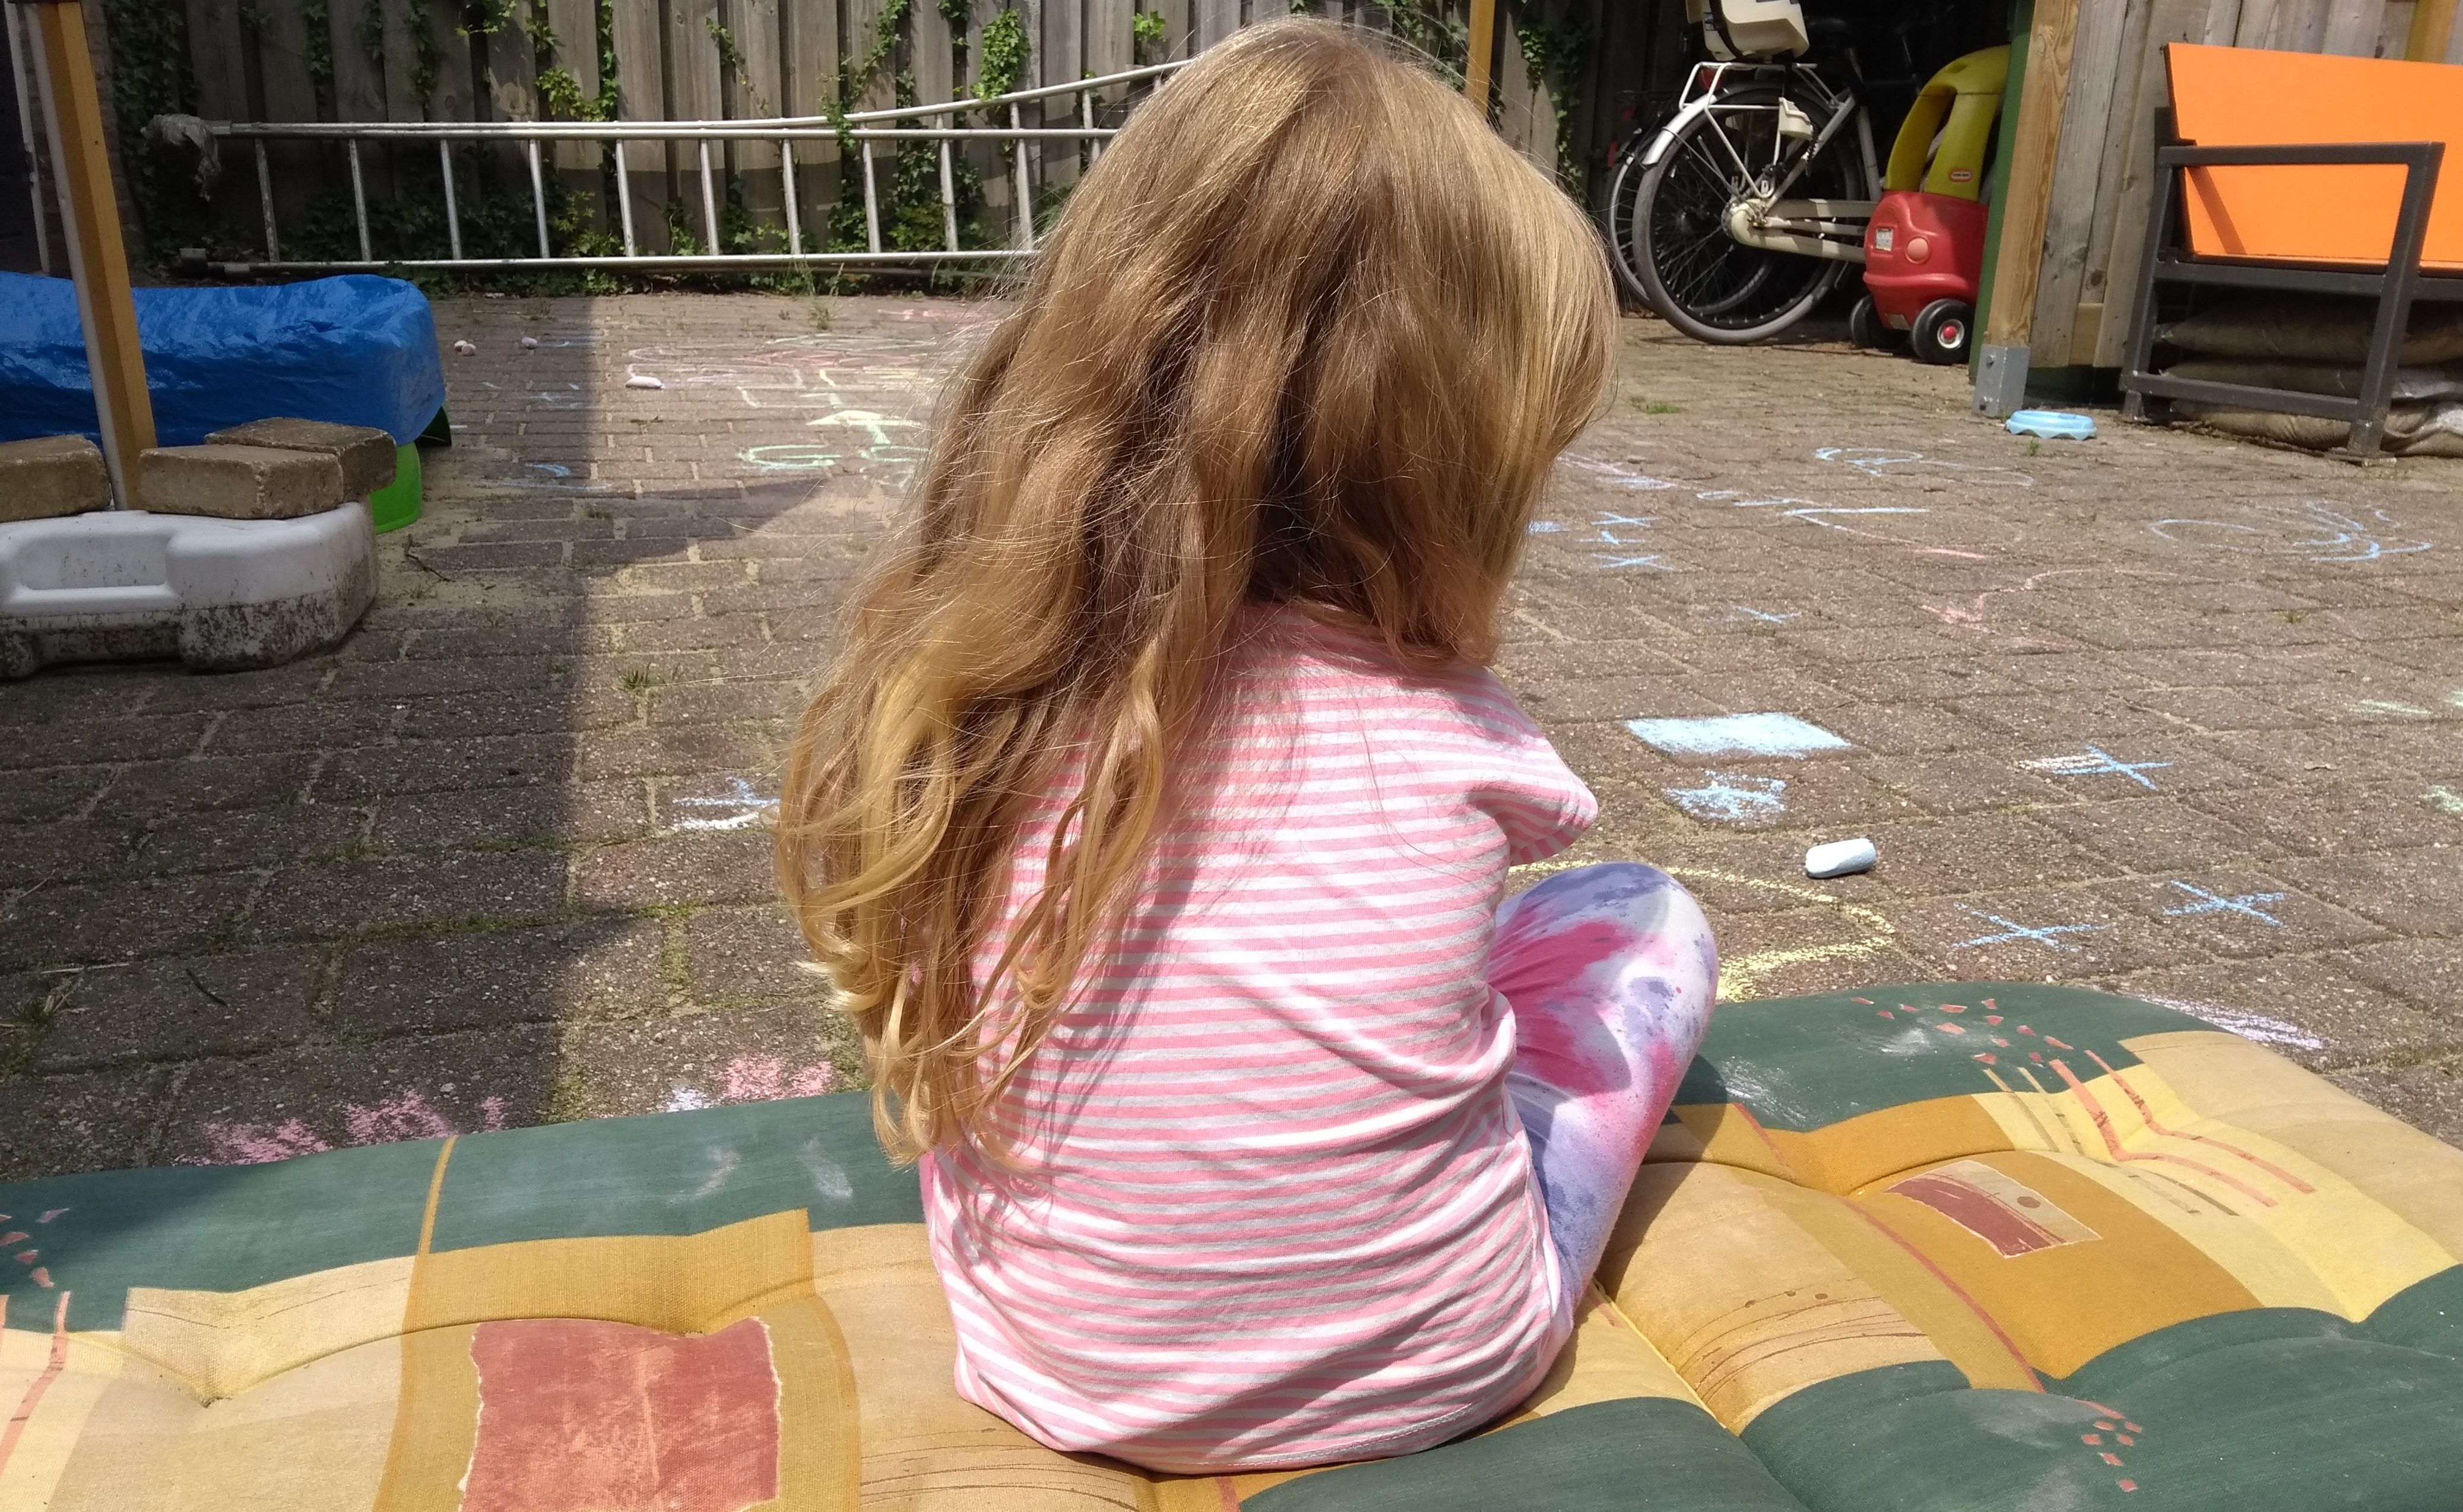 peuter life, peuter, peuterpuberteit, middagslaapje peuter, tanden poetsen peuter, zindelijkheid peuter, mamablog, mamalifestyleblog, la log, lalog.nl